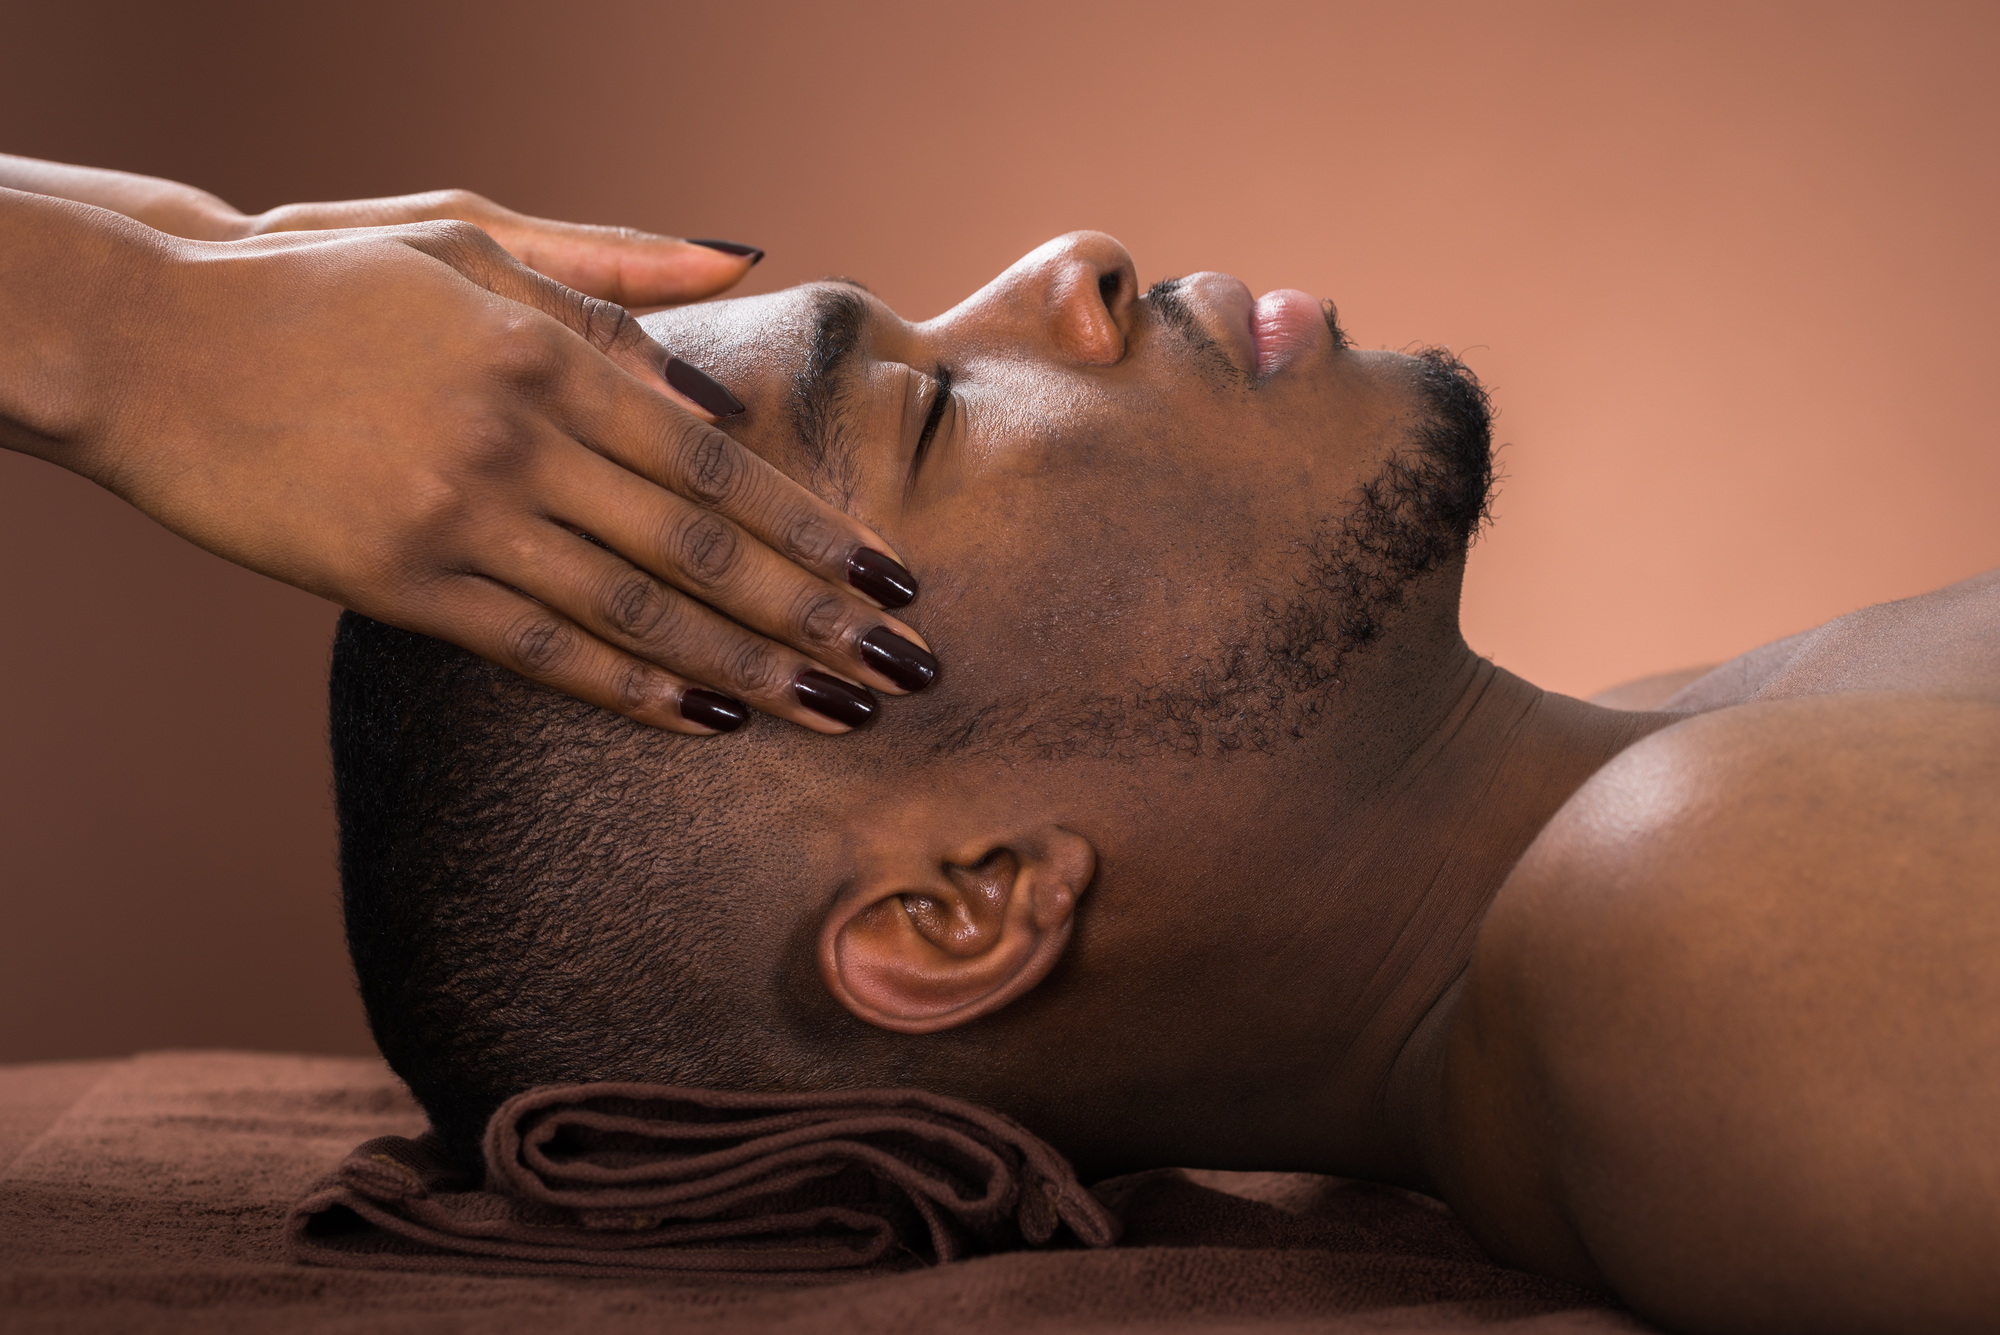 massage_therapy_atlanta_georgia_1.jpg